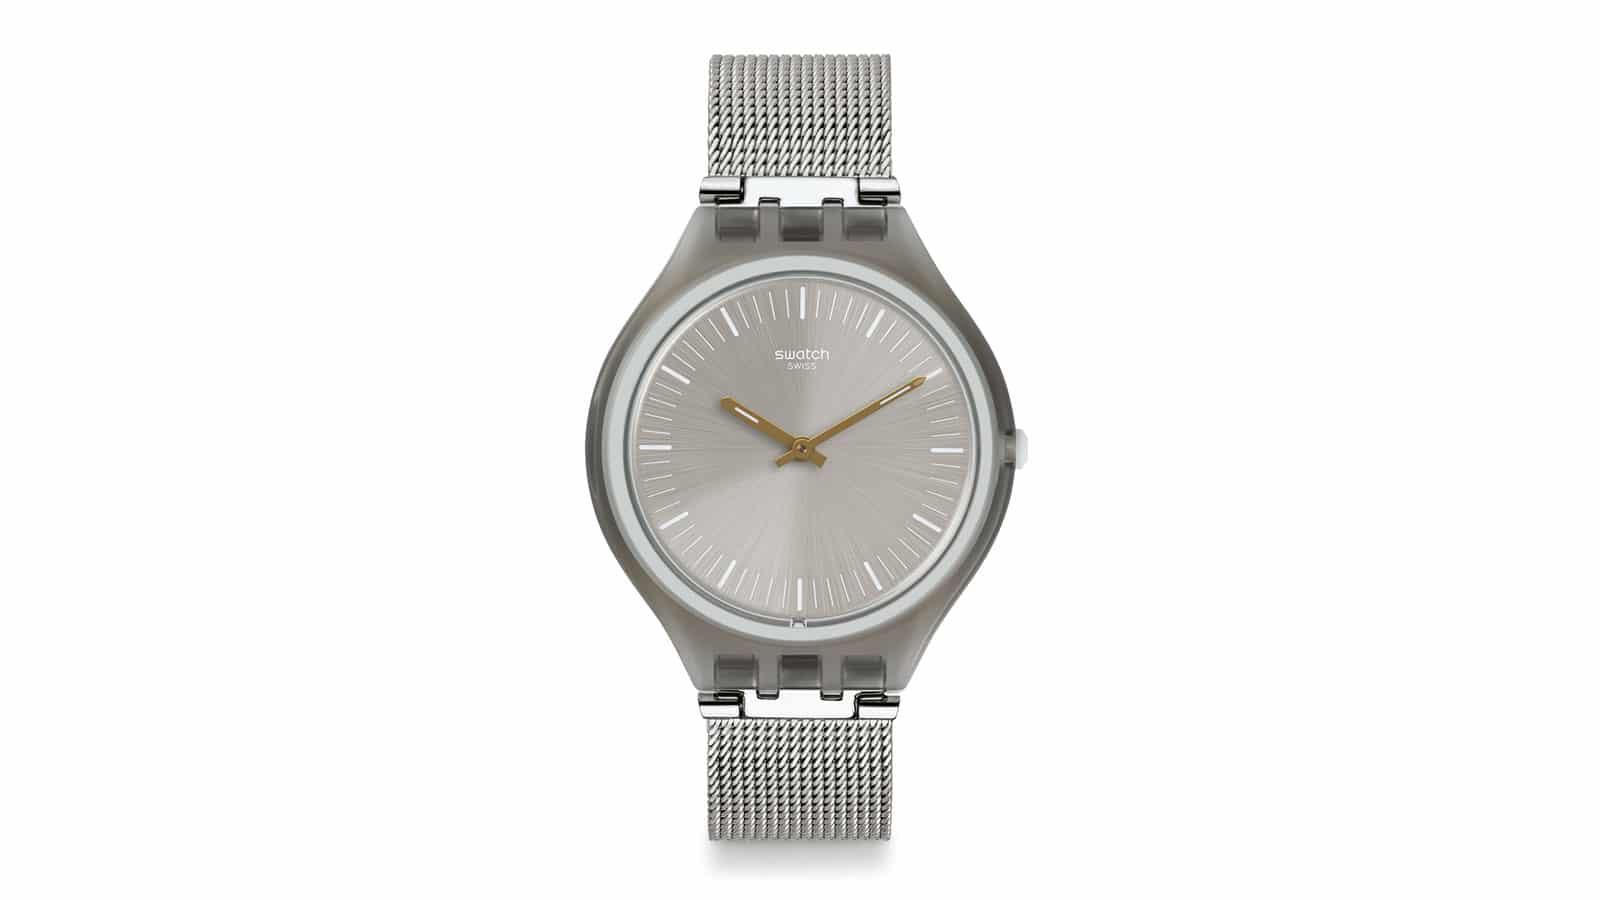 Montre-Swatch_SKINMESH_Lionel-Meylan-horlogerie-joaillerie-vevey